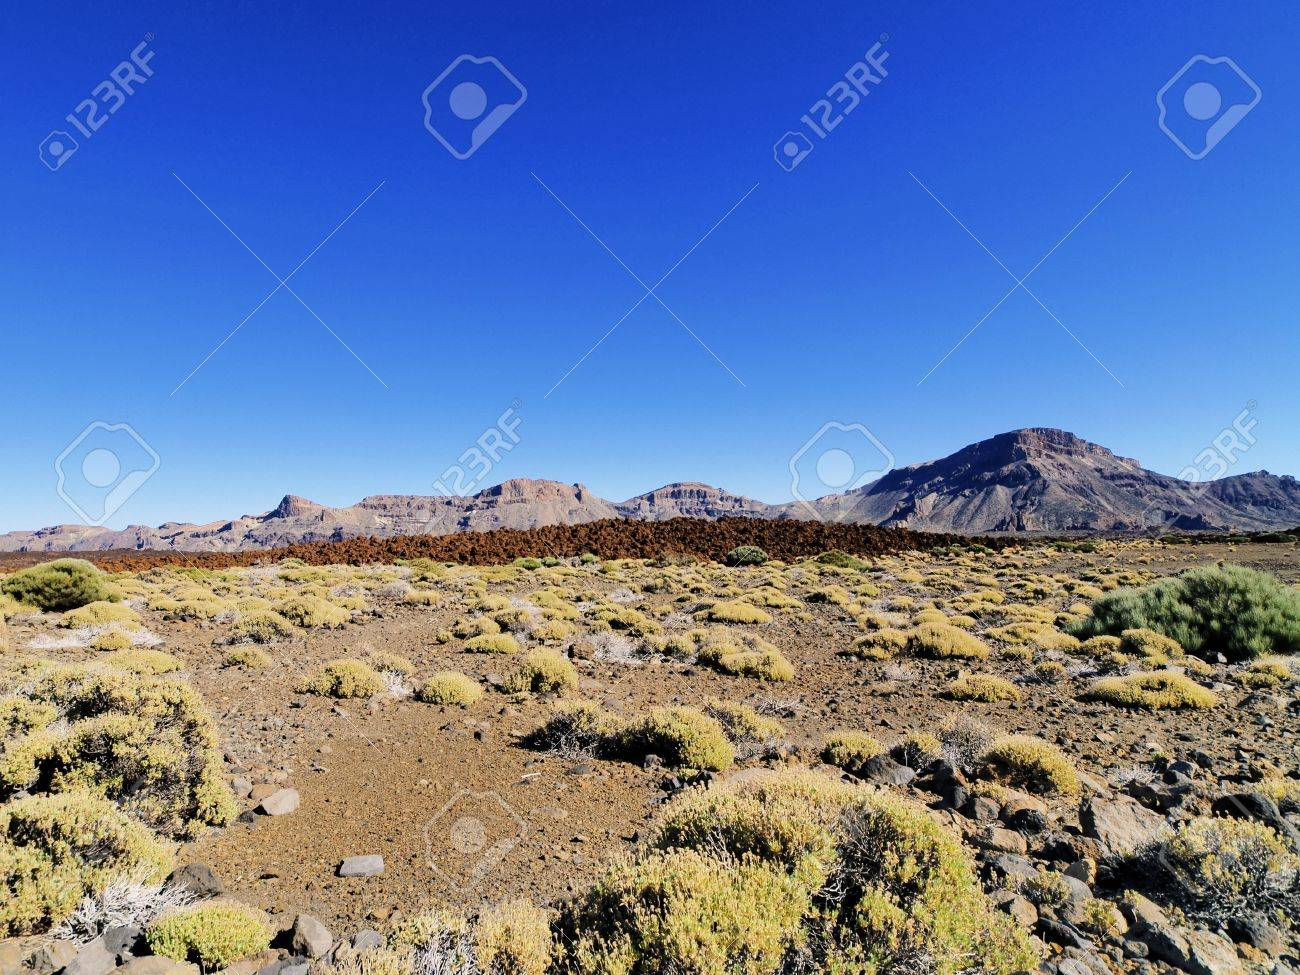 Teide National Park, Tenerife, Canary Islands, Spain Stock Photo - 16679255